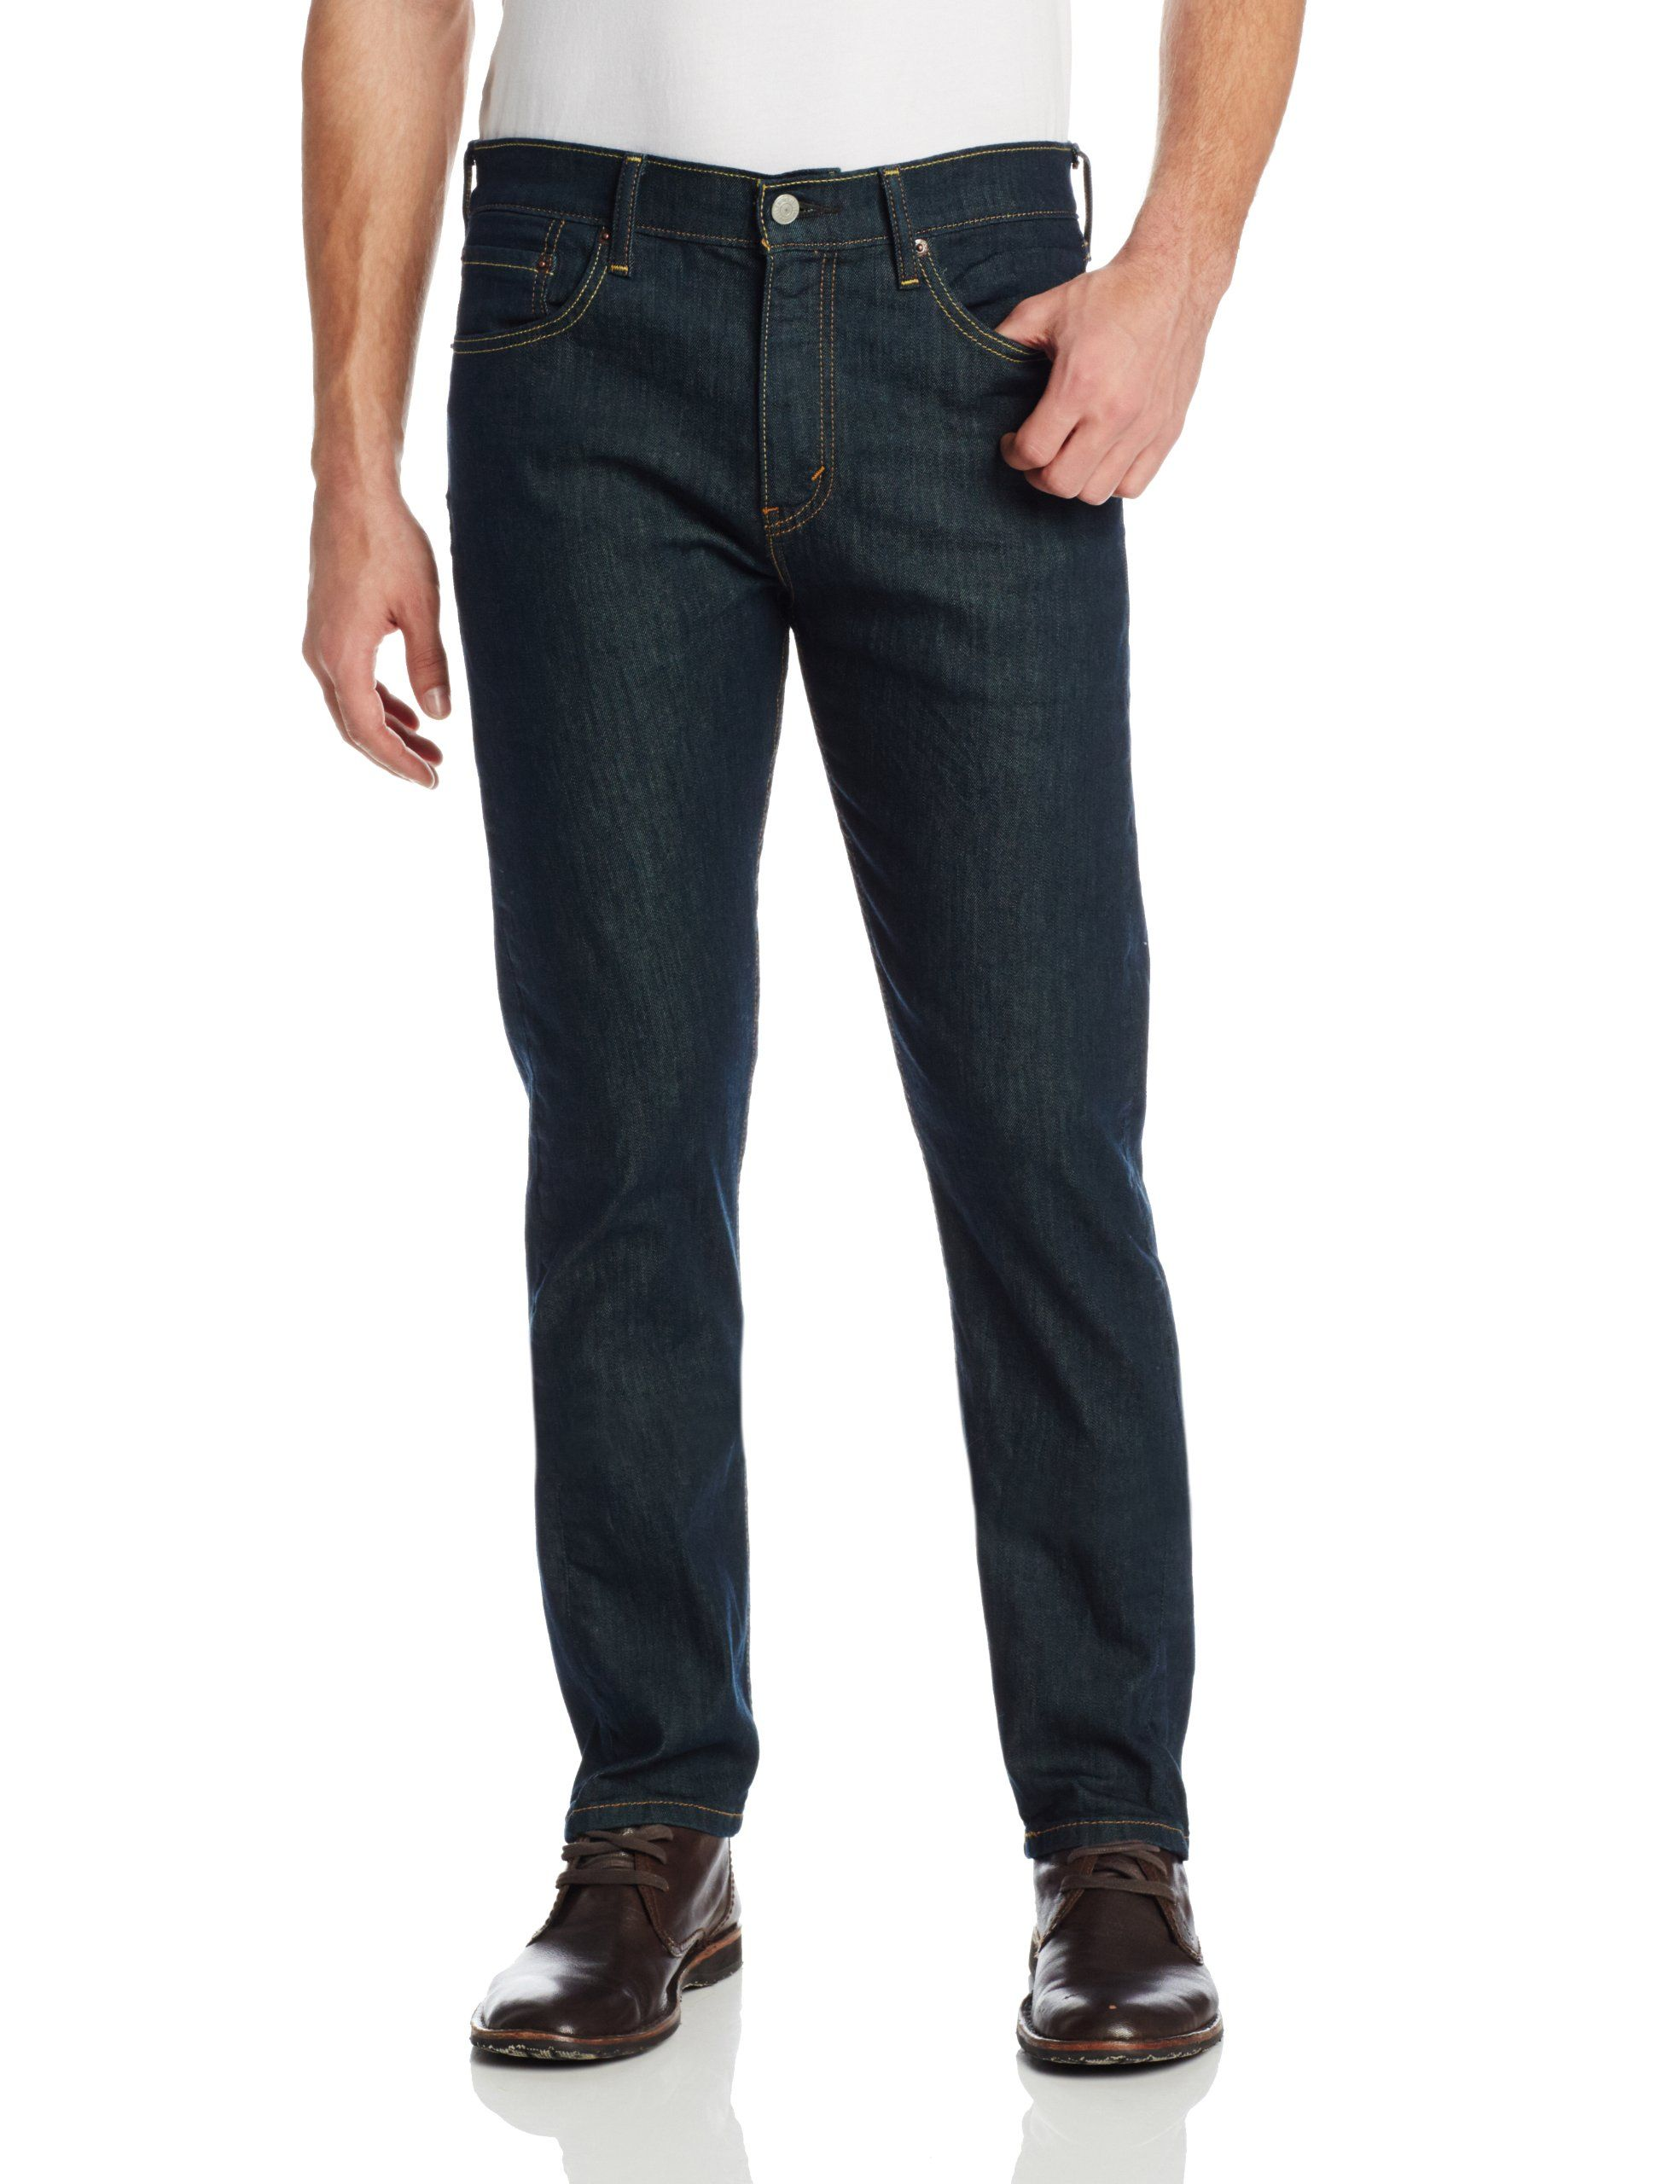 77a935e1c67 Levi's Men's 508 Regular Taper Fit Jean, Rinsed Playa, 36x30 ...